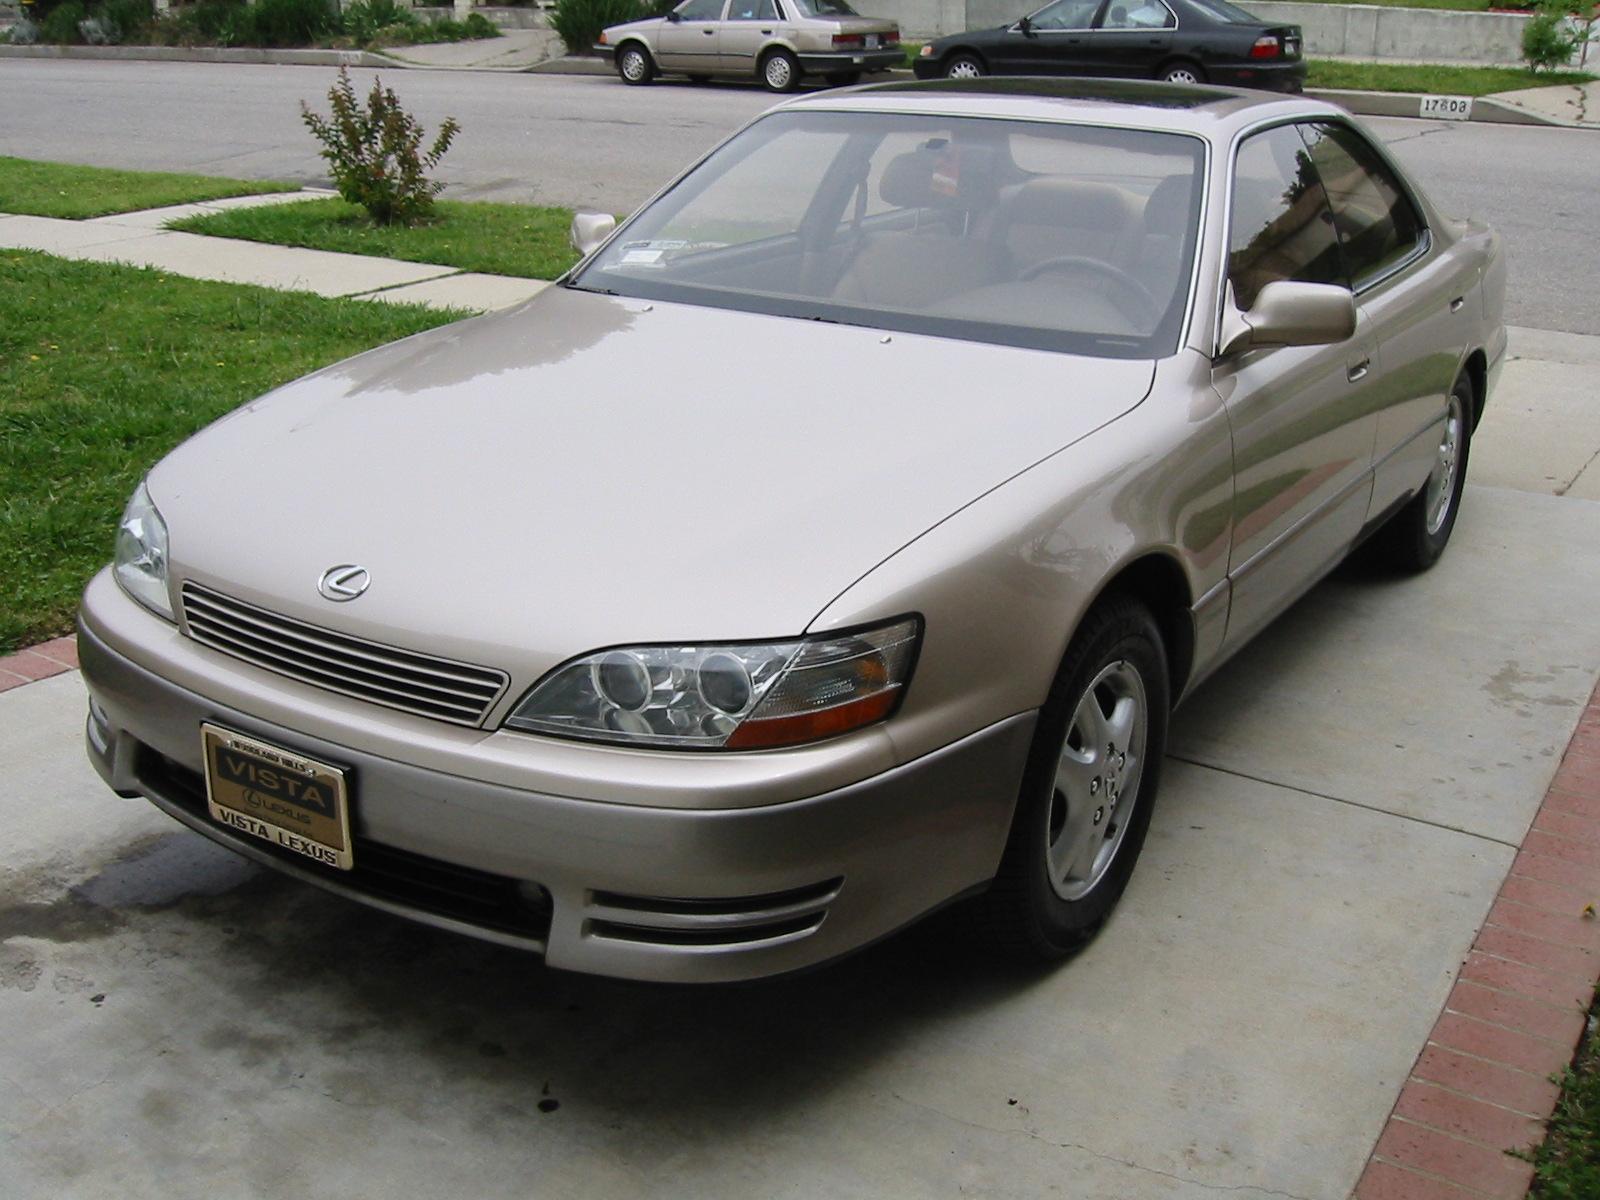 1993 Lexus ES 300 Partsopen